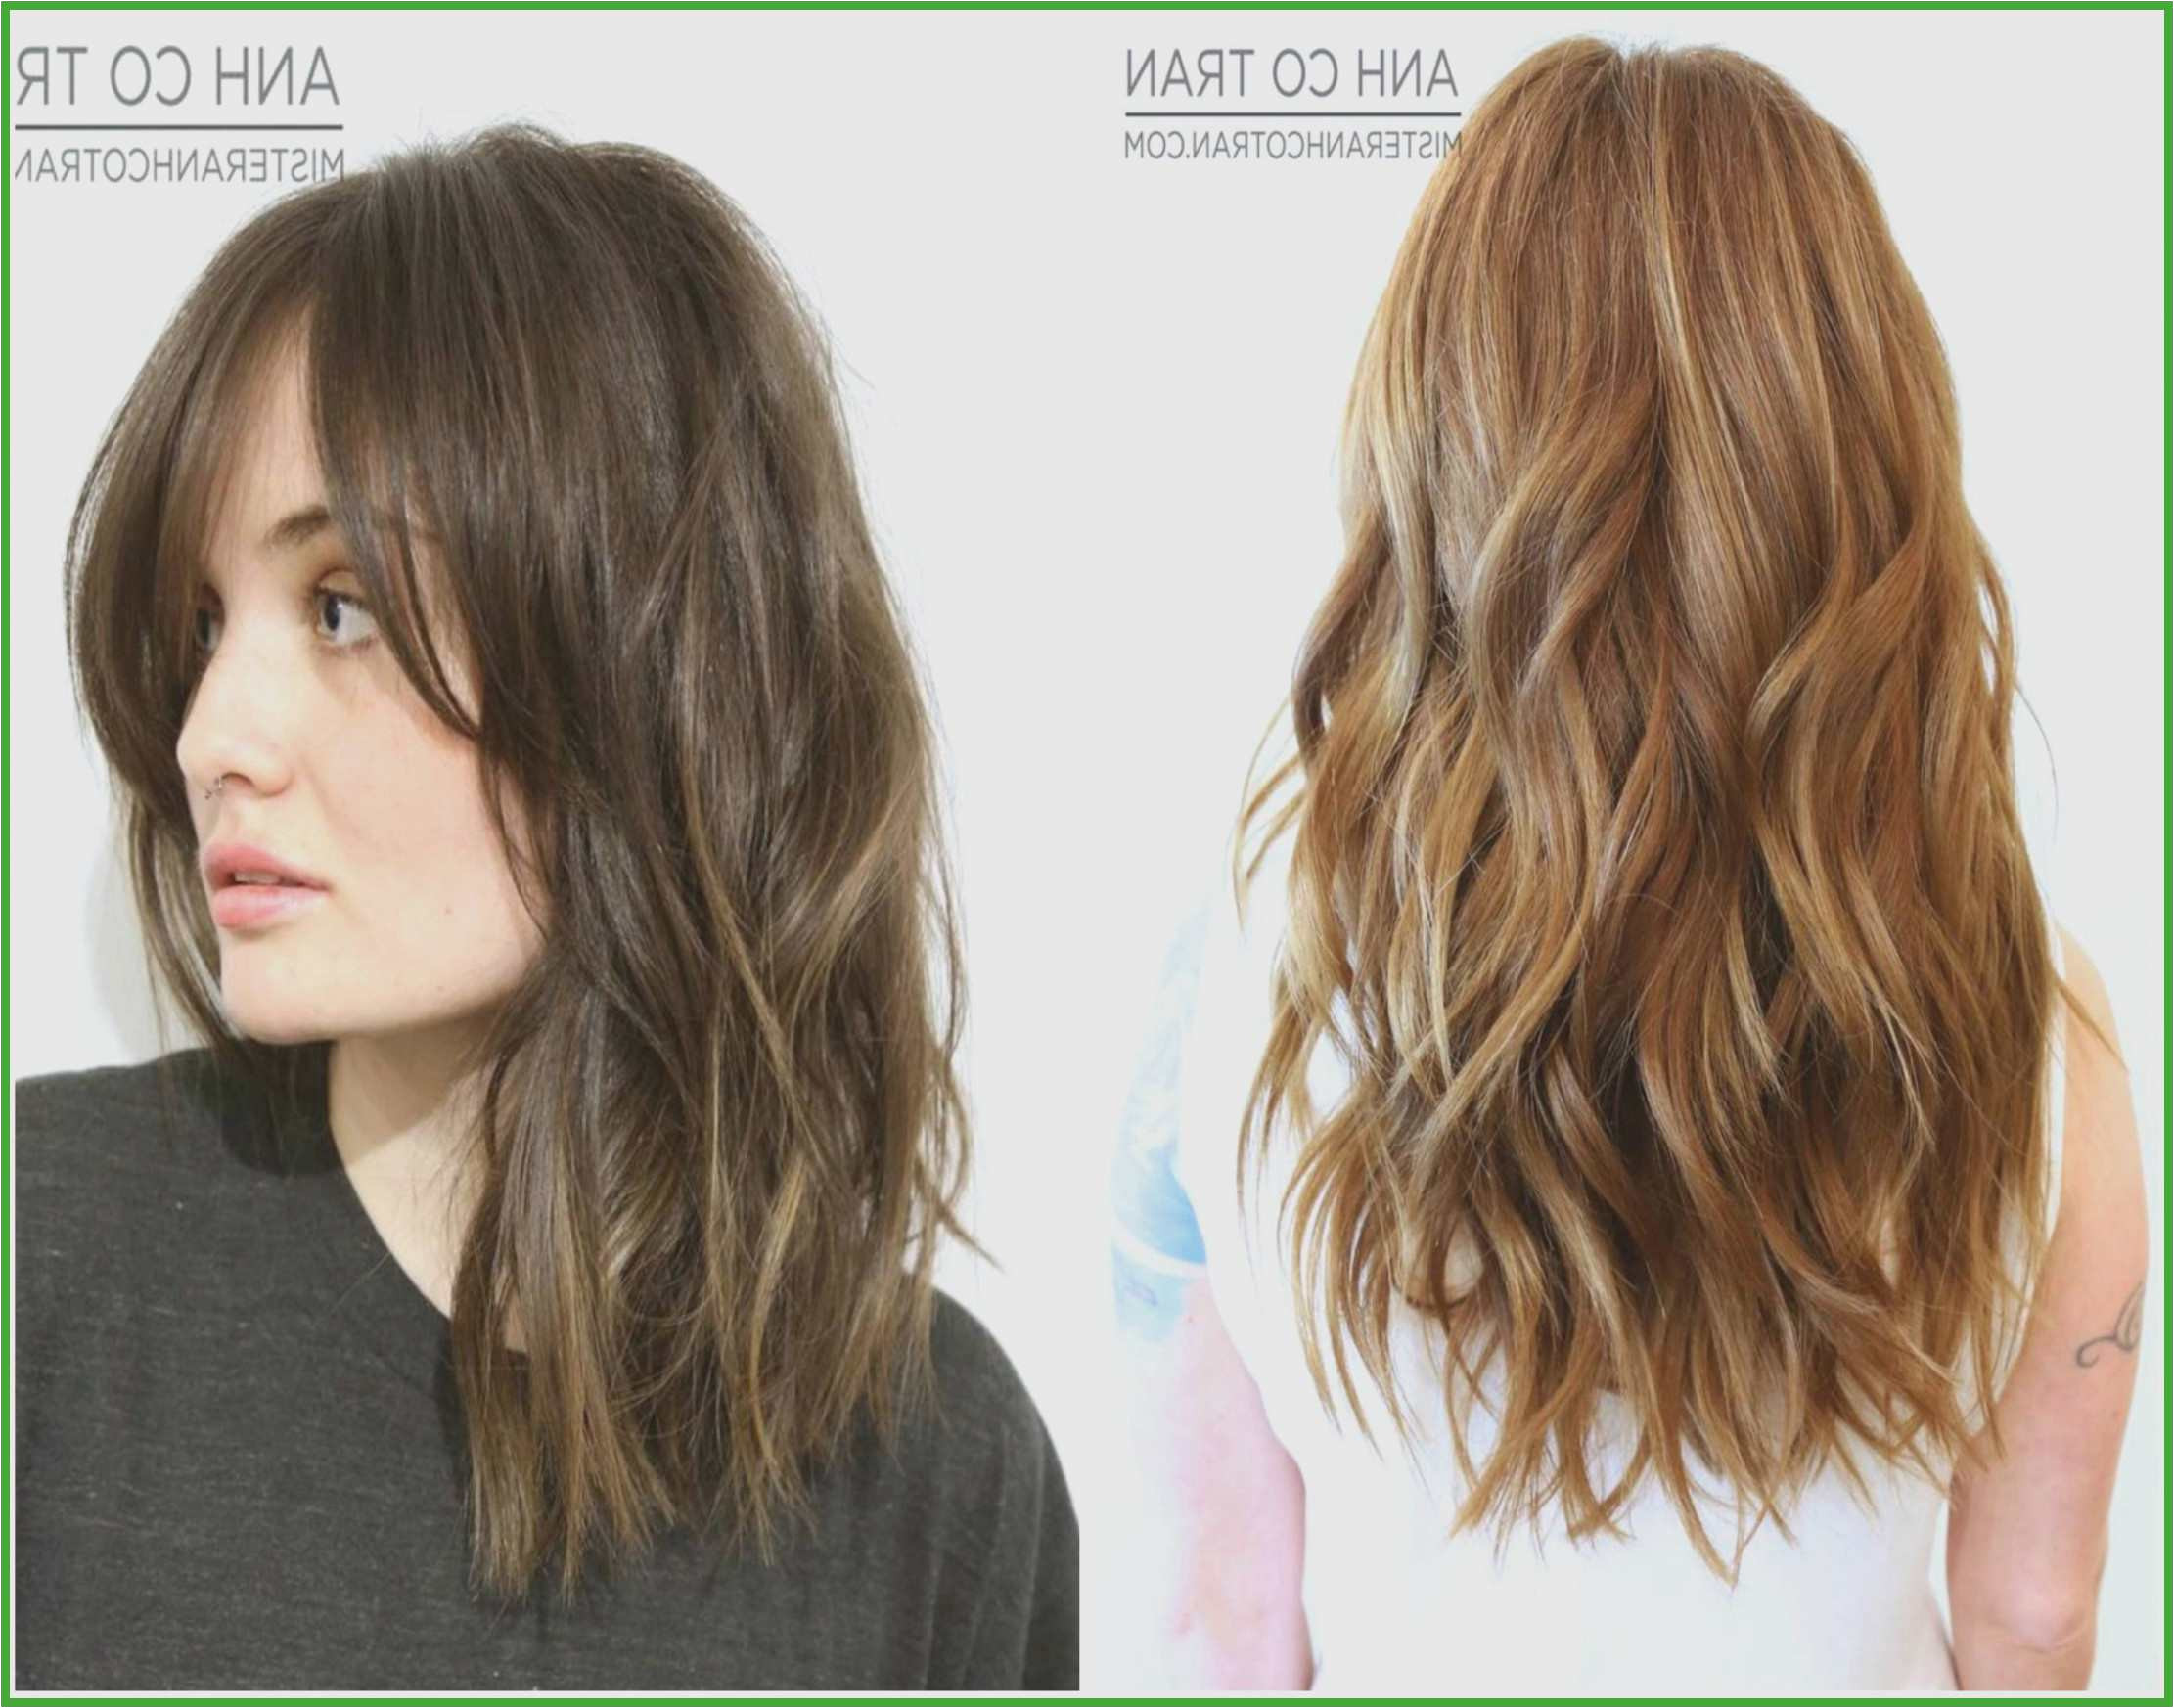 Simple Medium Length Hair Cut for Curly Hair Very Curly Hairstyles Fresh Curly Hair 0d Archives